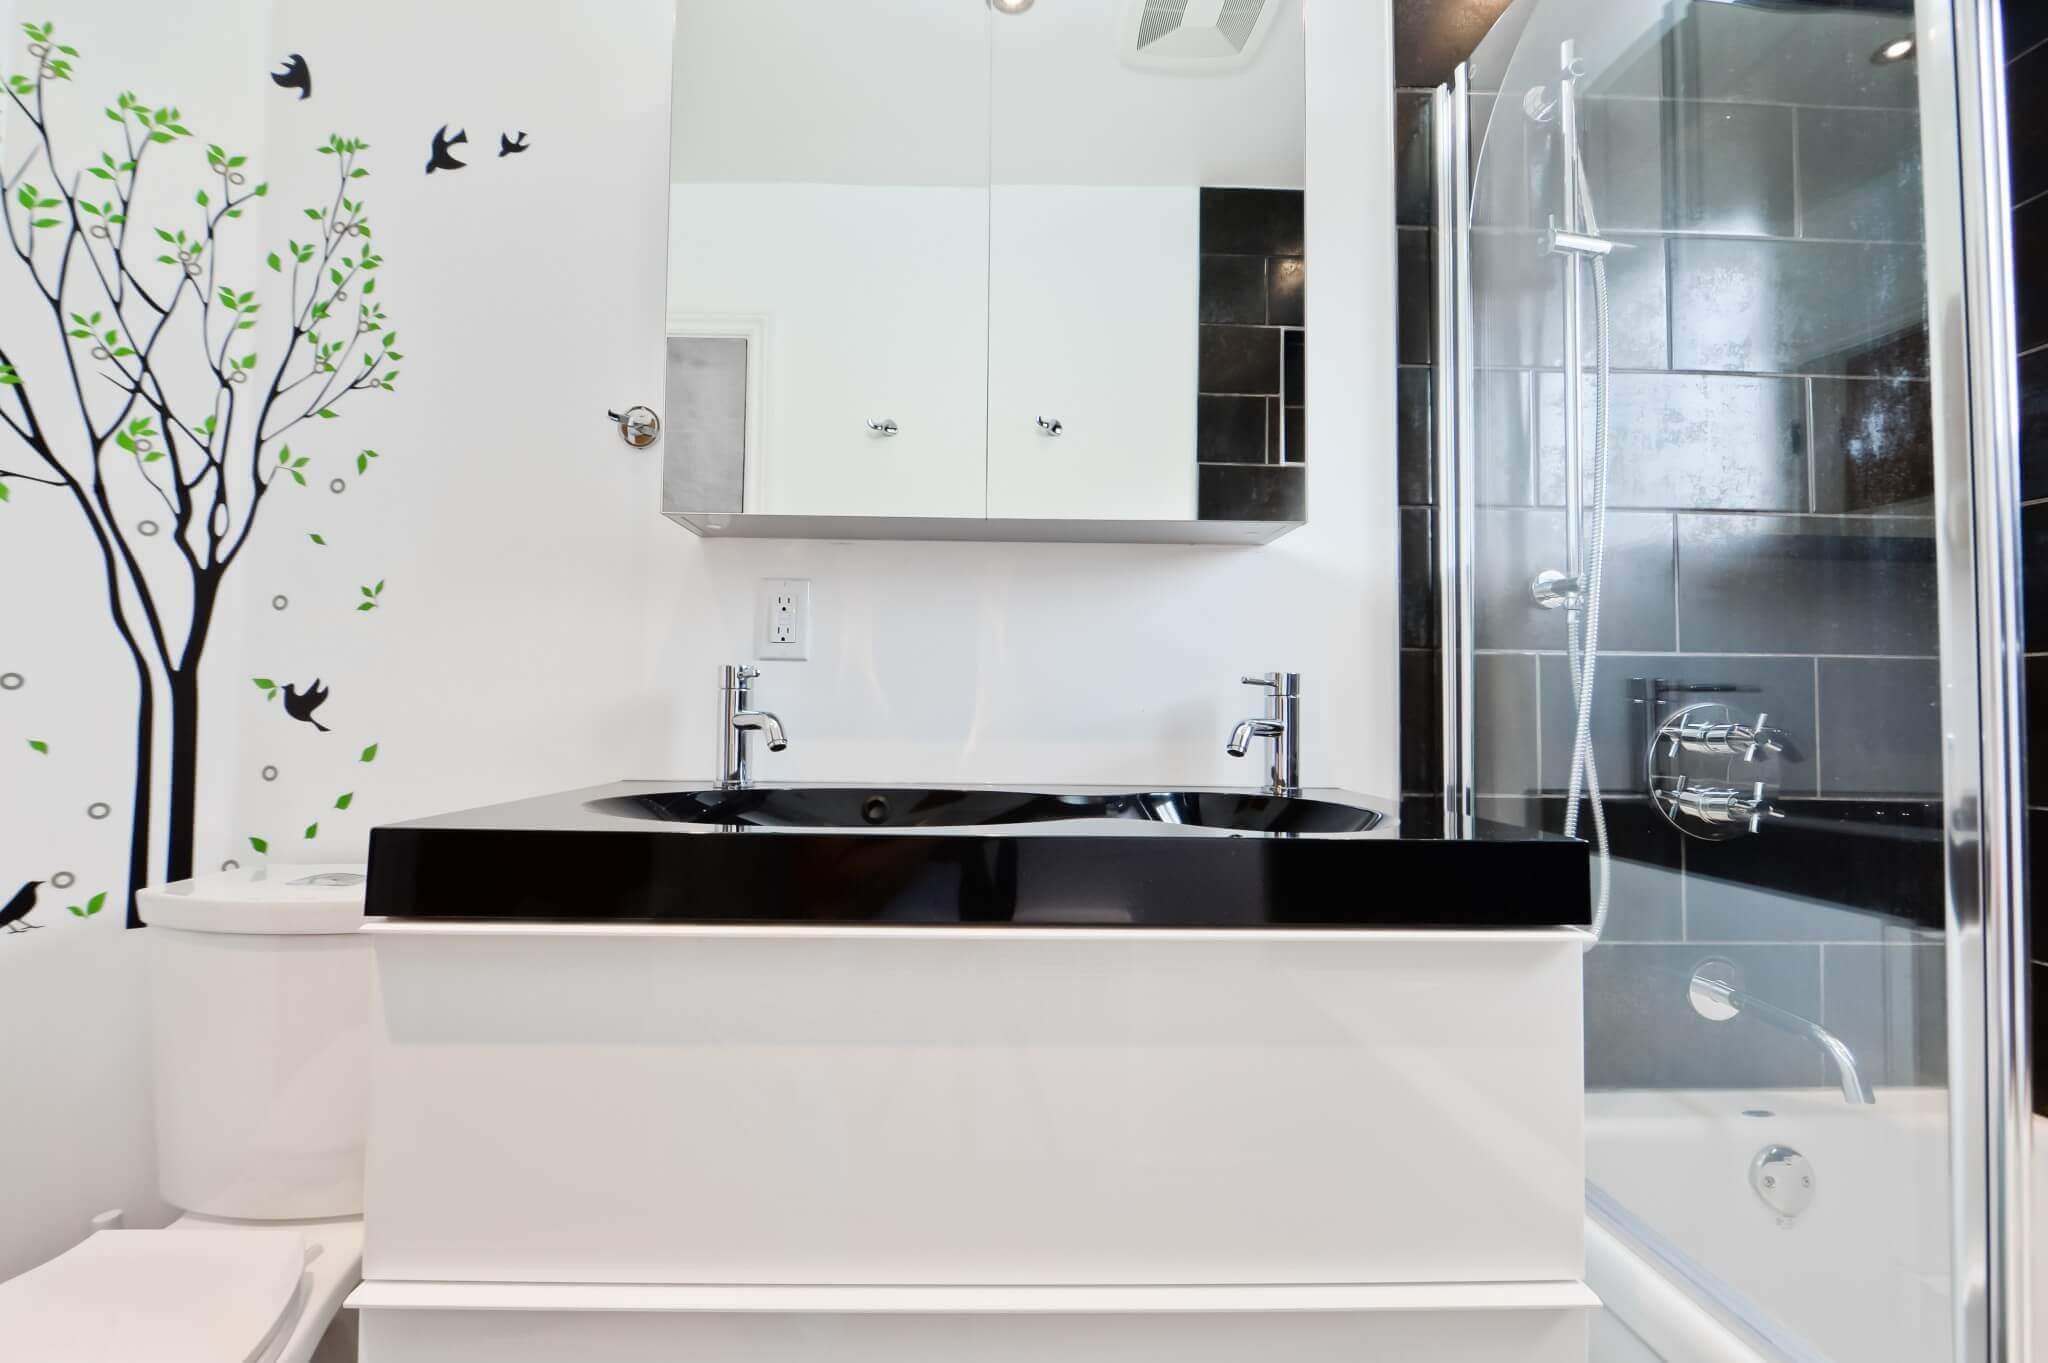 lavabo noir et vanite blanche